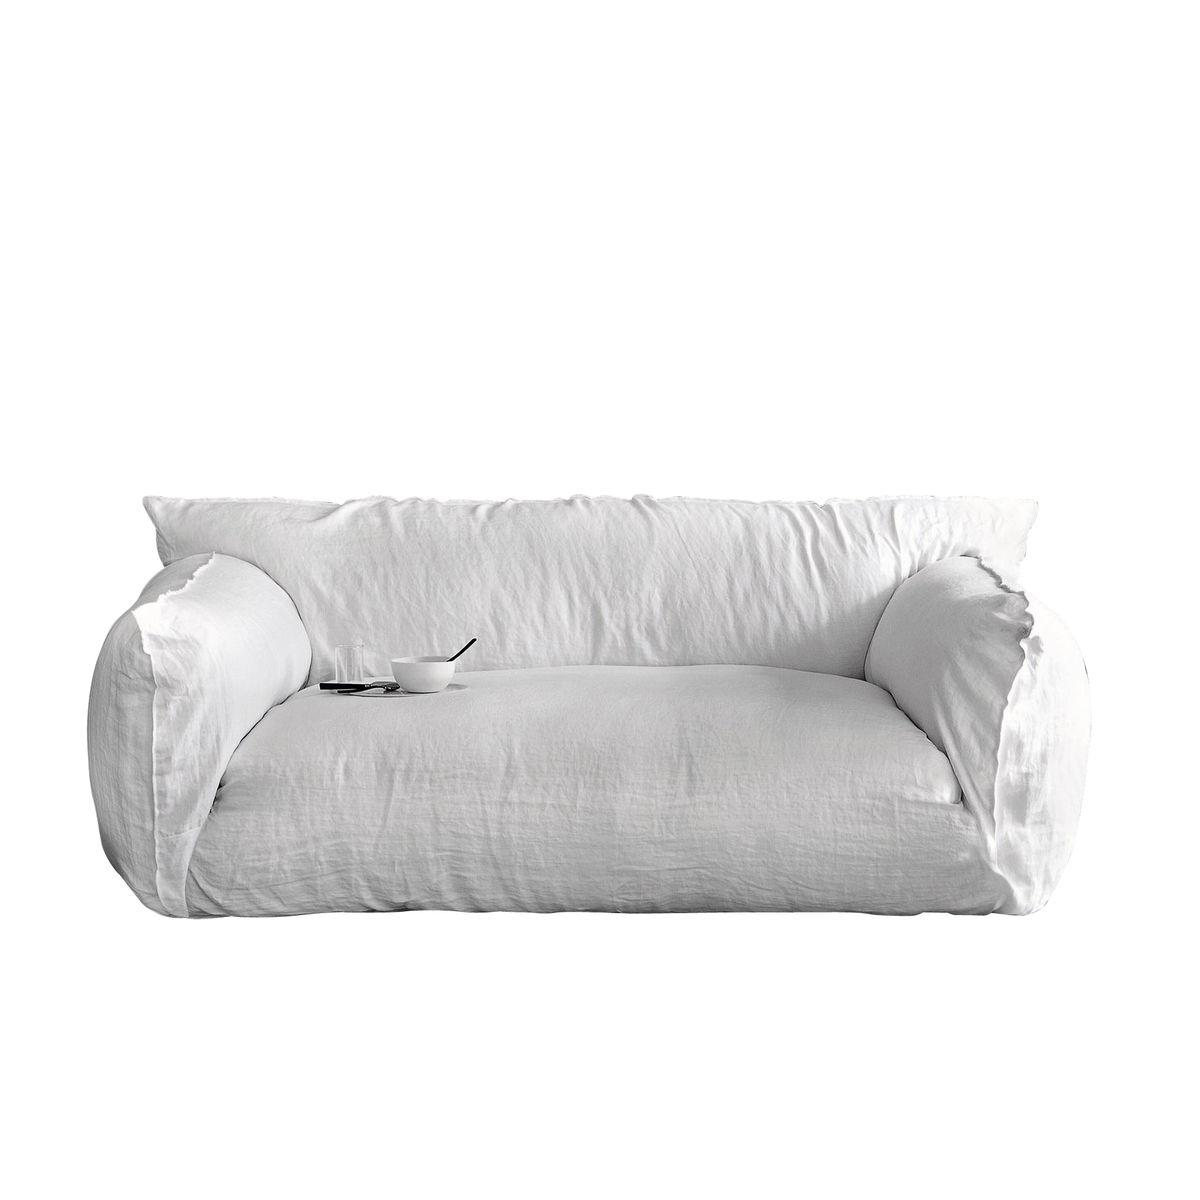 Home nuvola italian inspired leather dark grey sofa collection - Gervasoni Nuvola 10 Sofa White Fabric Lino Bianco